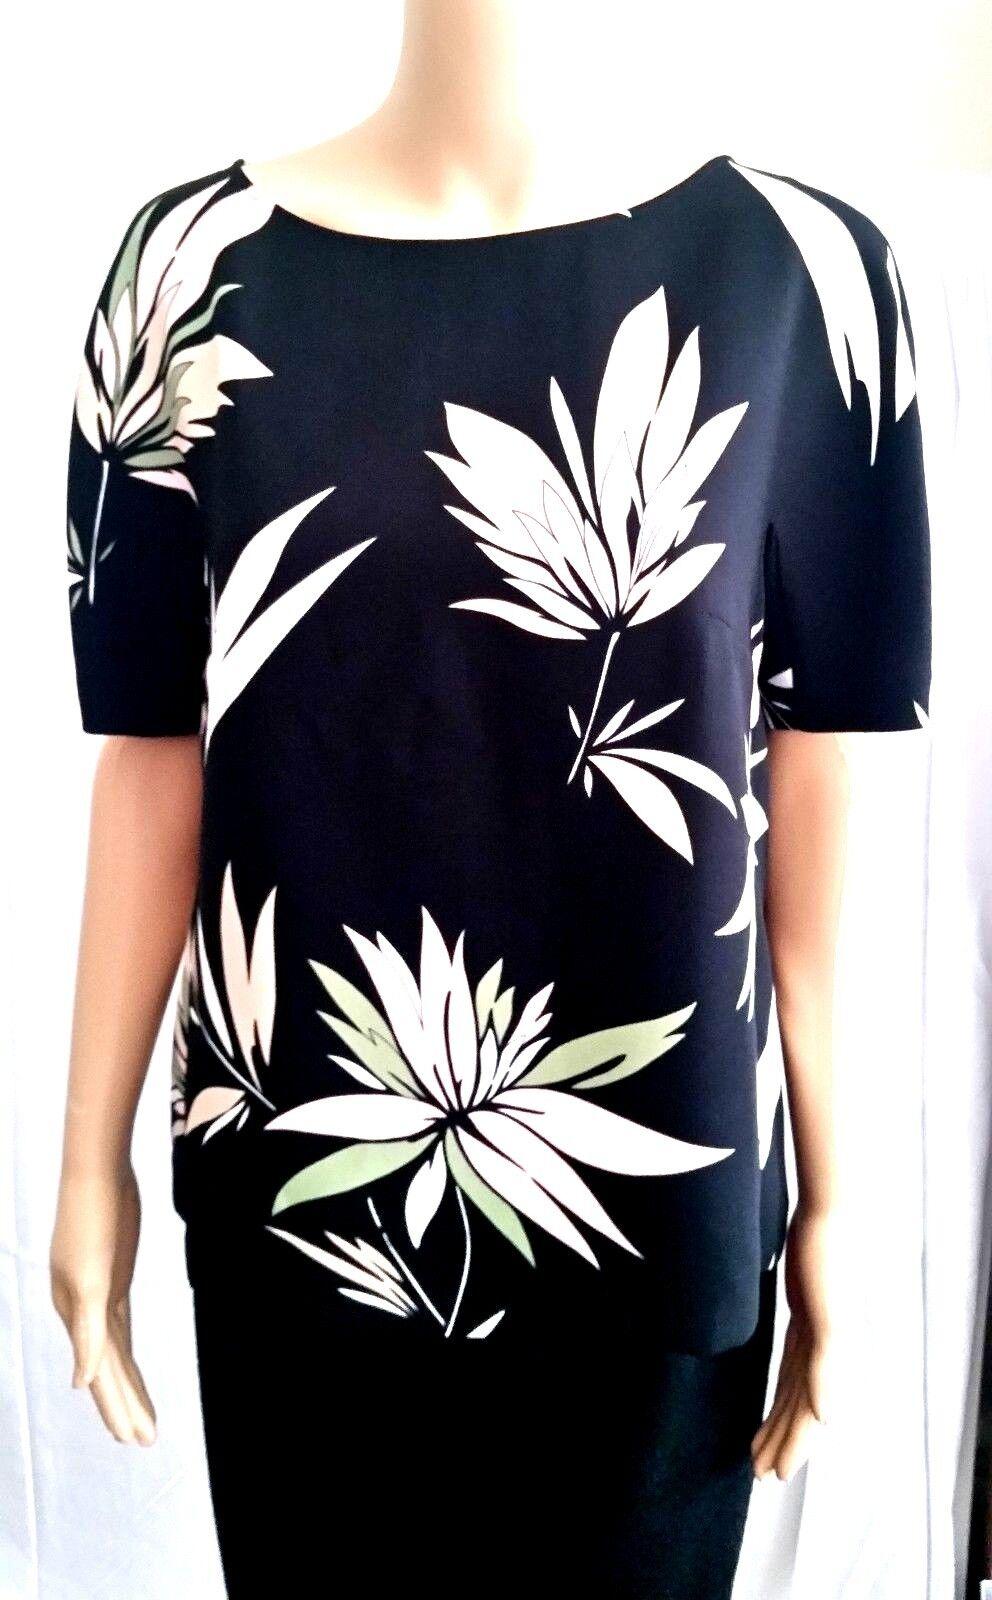 New MAX MARA Studio Floral Printed Blouse Größe 8 USA, 42 I, schwarz made in